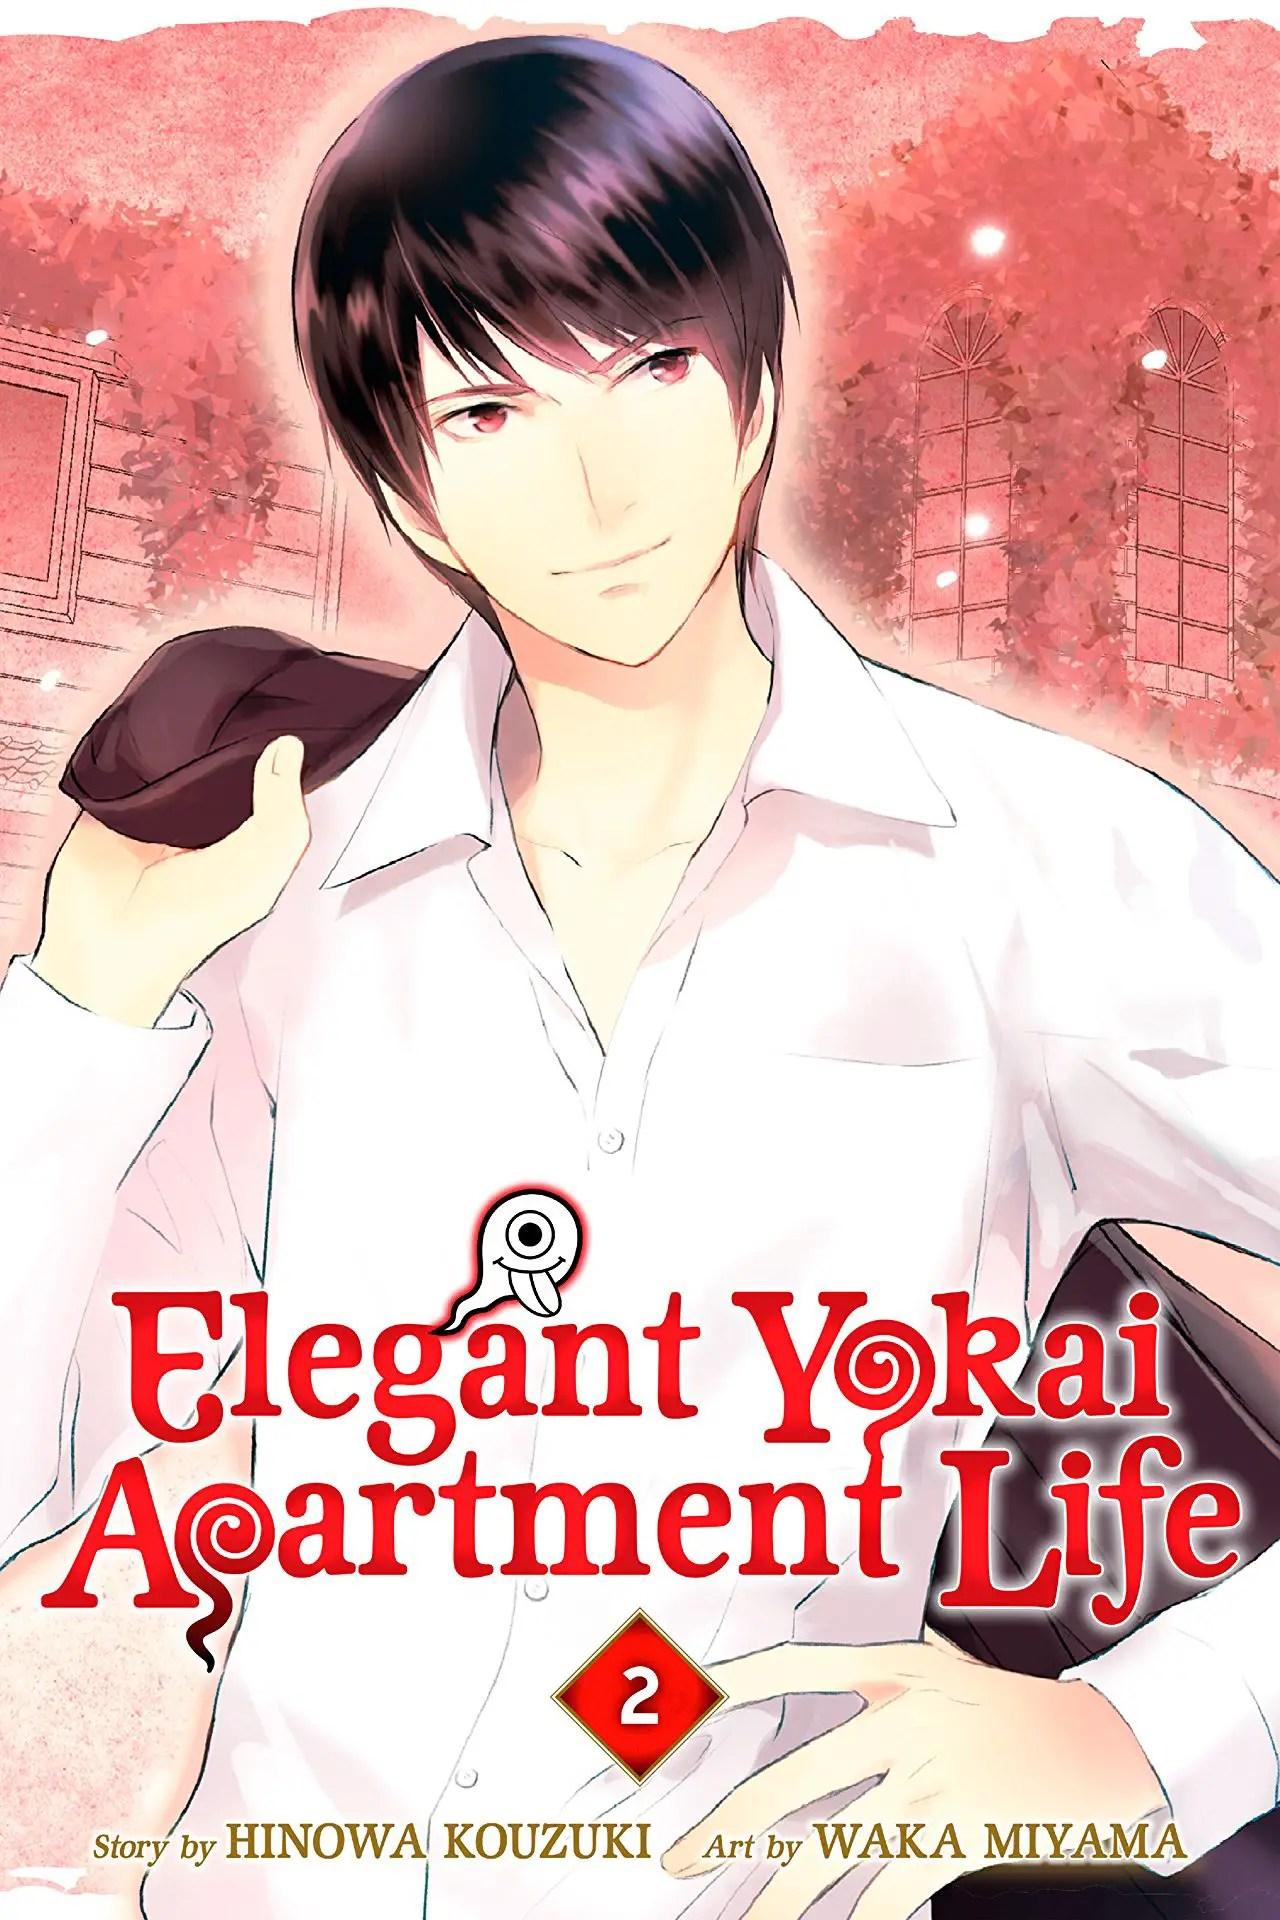 Elegant Yokai Apartment Life Vol. 2 Review